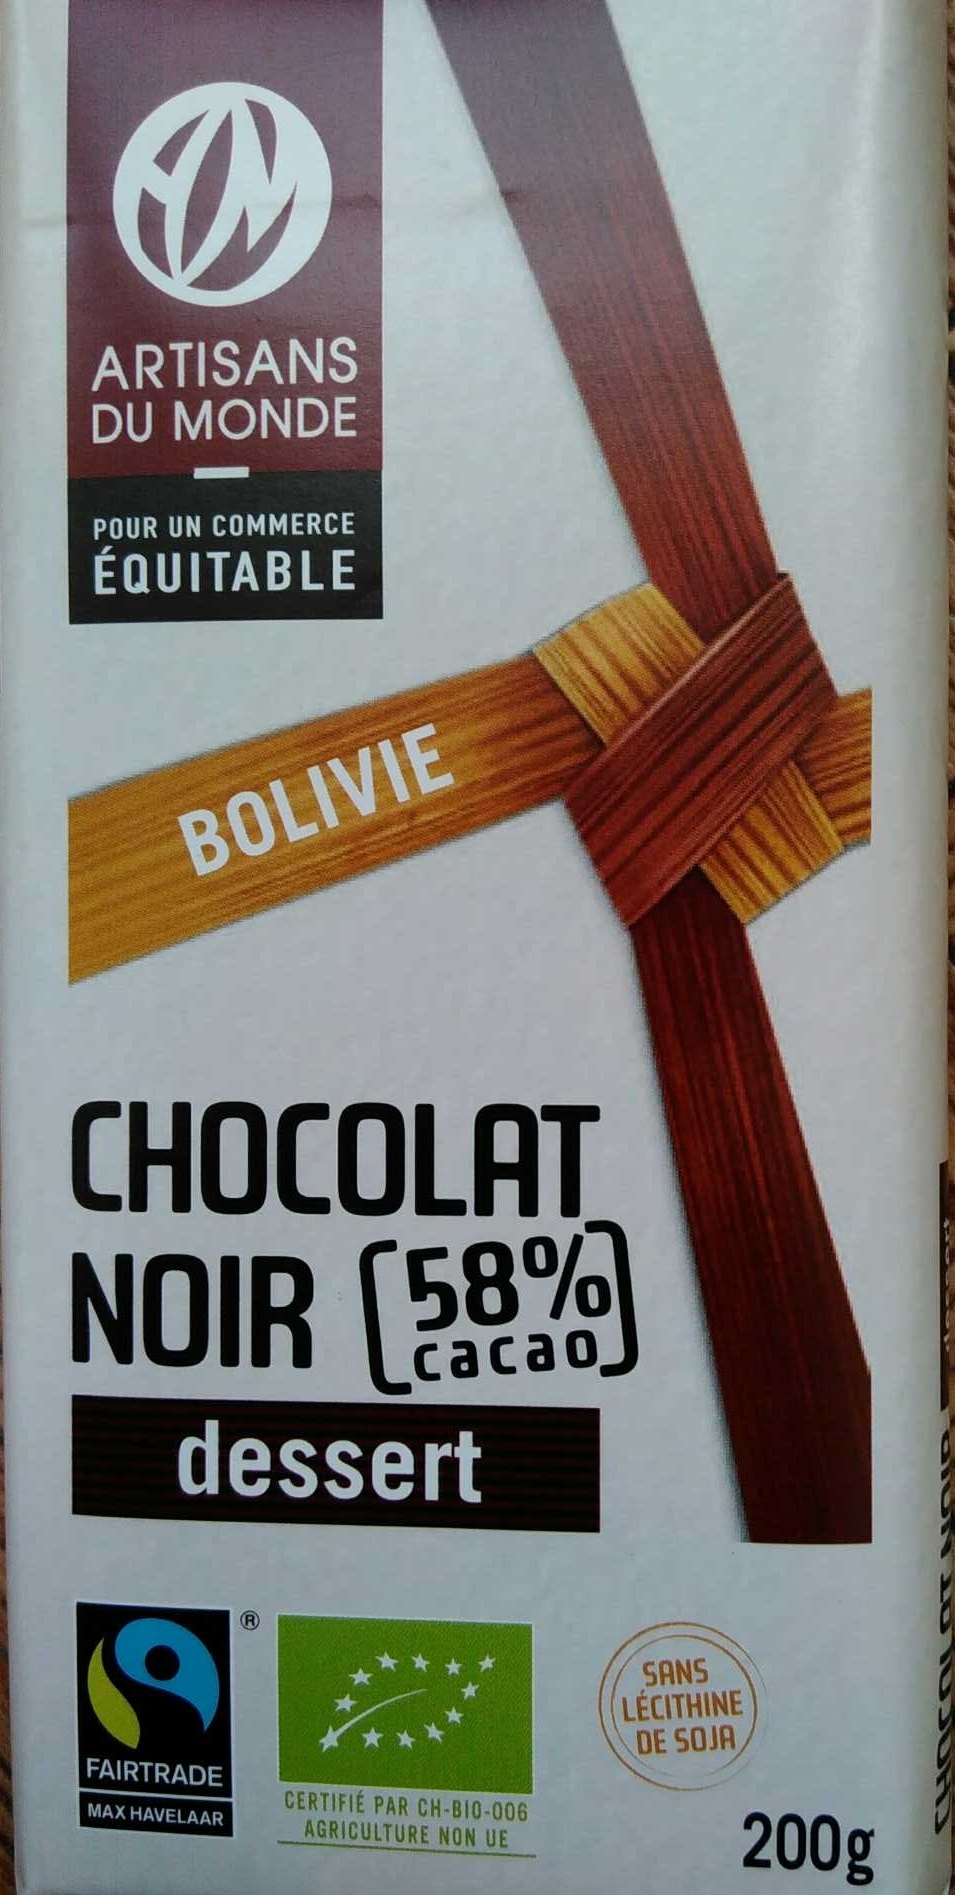 Chocolat noir dessert 58% cacao, Bolivie - Product